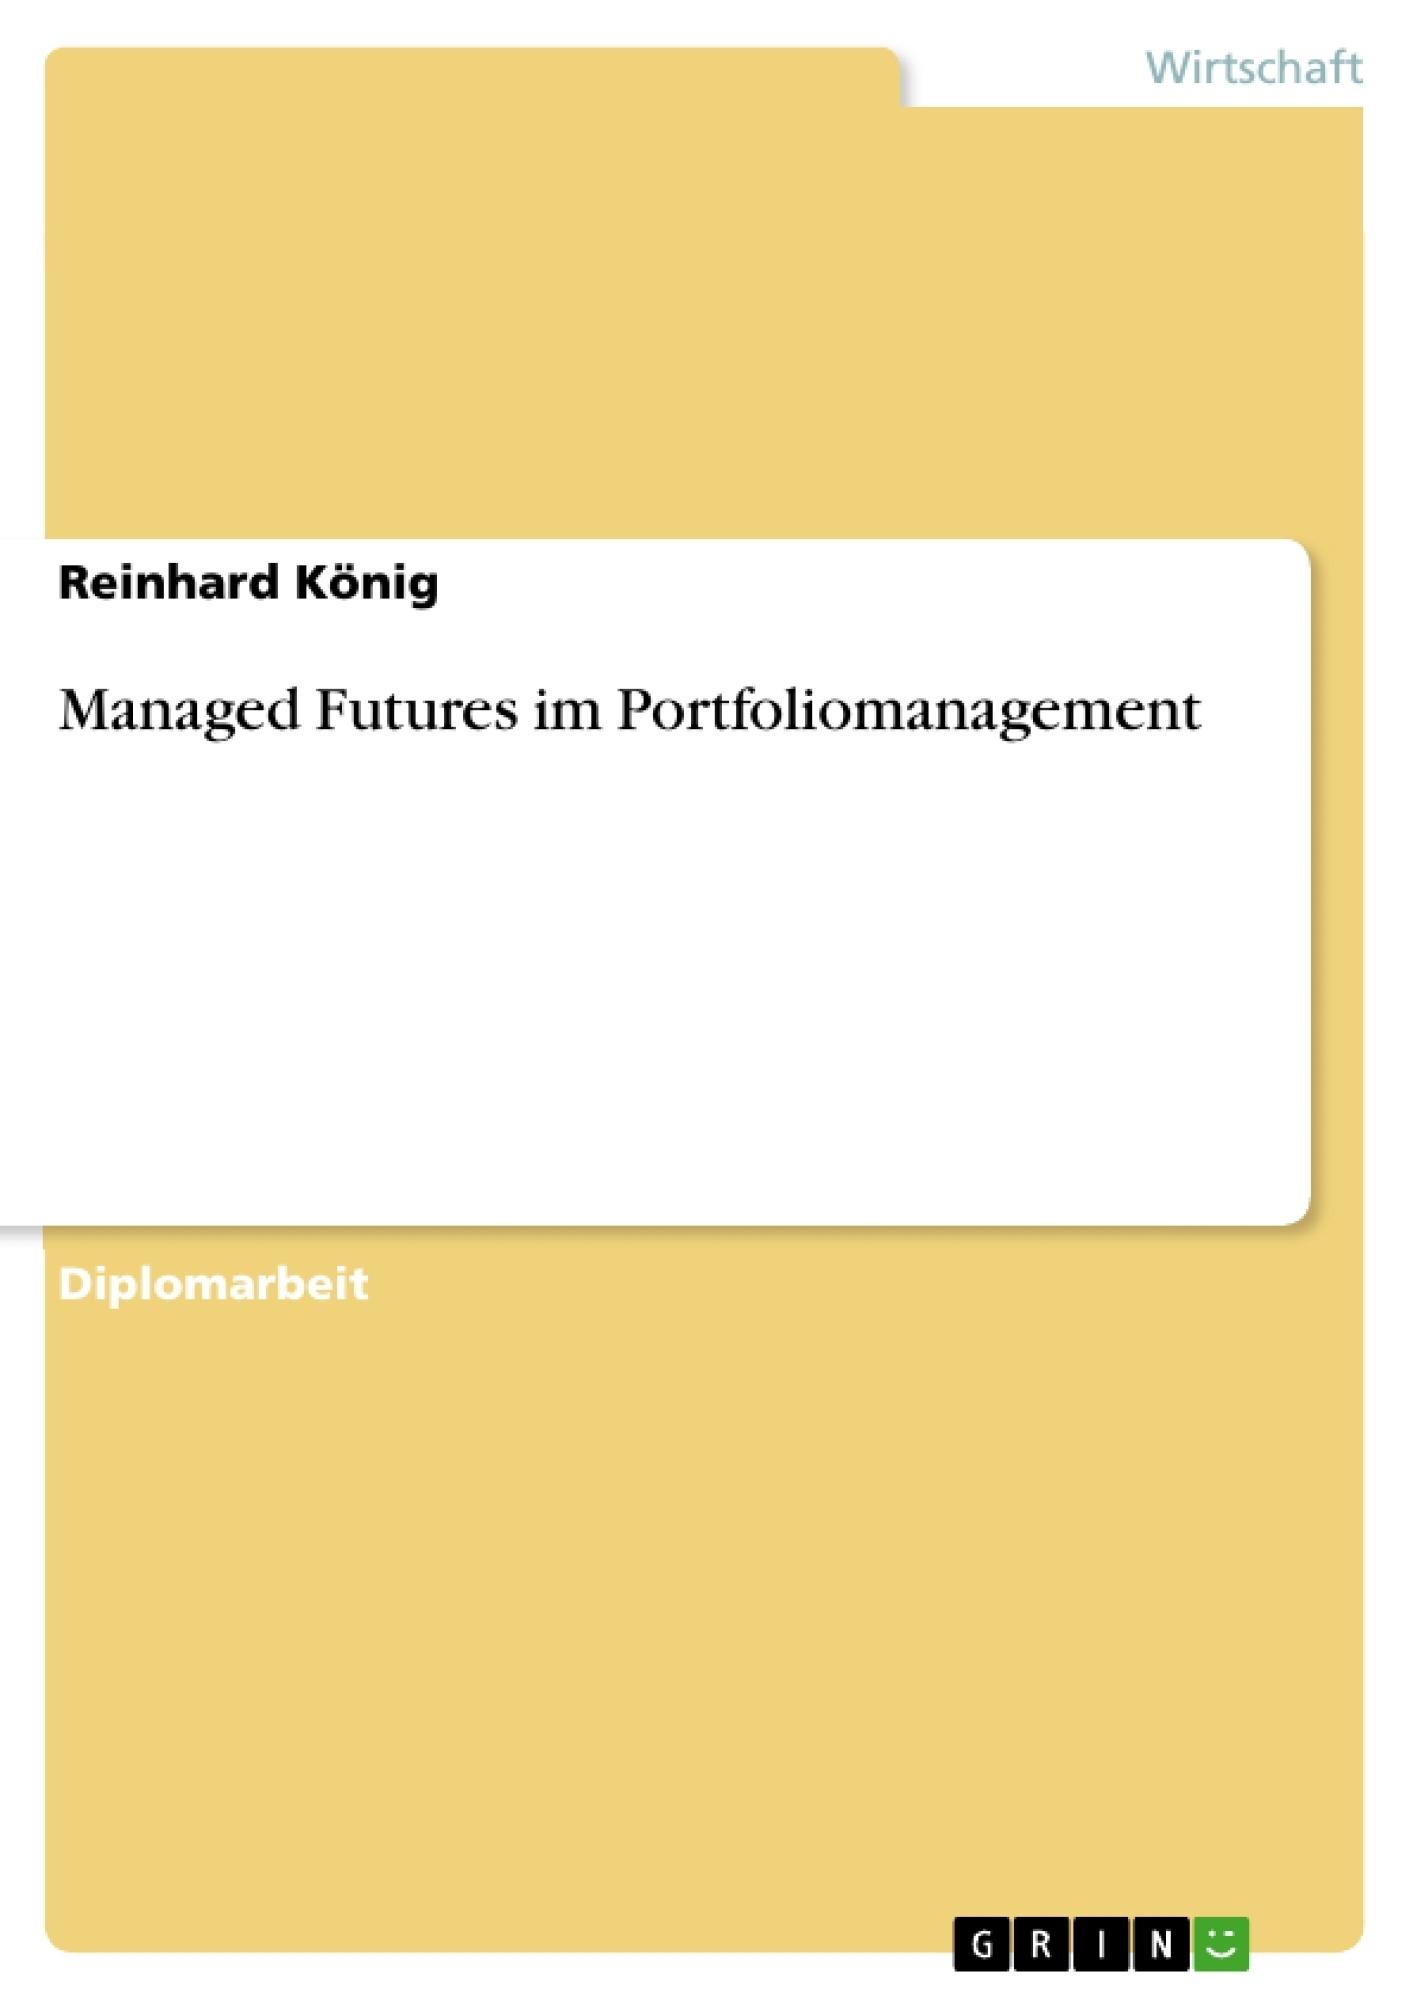 Titel: Managed Futures im Portfoliomanagement